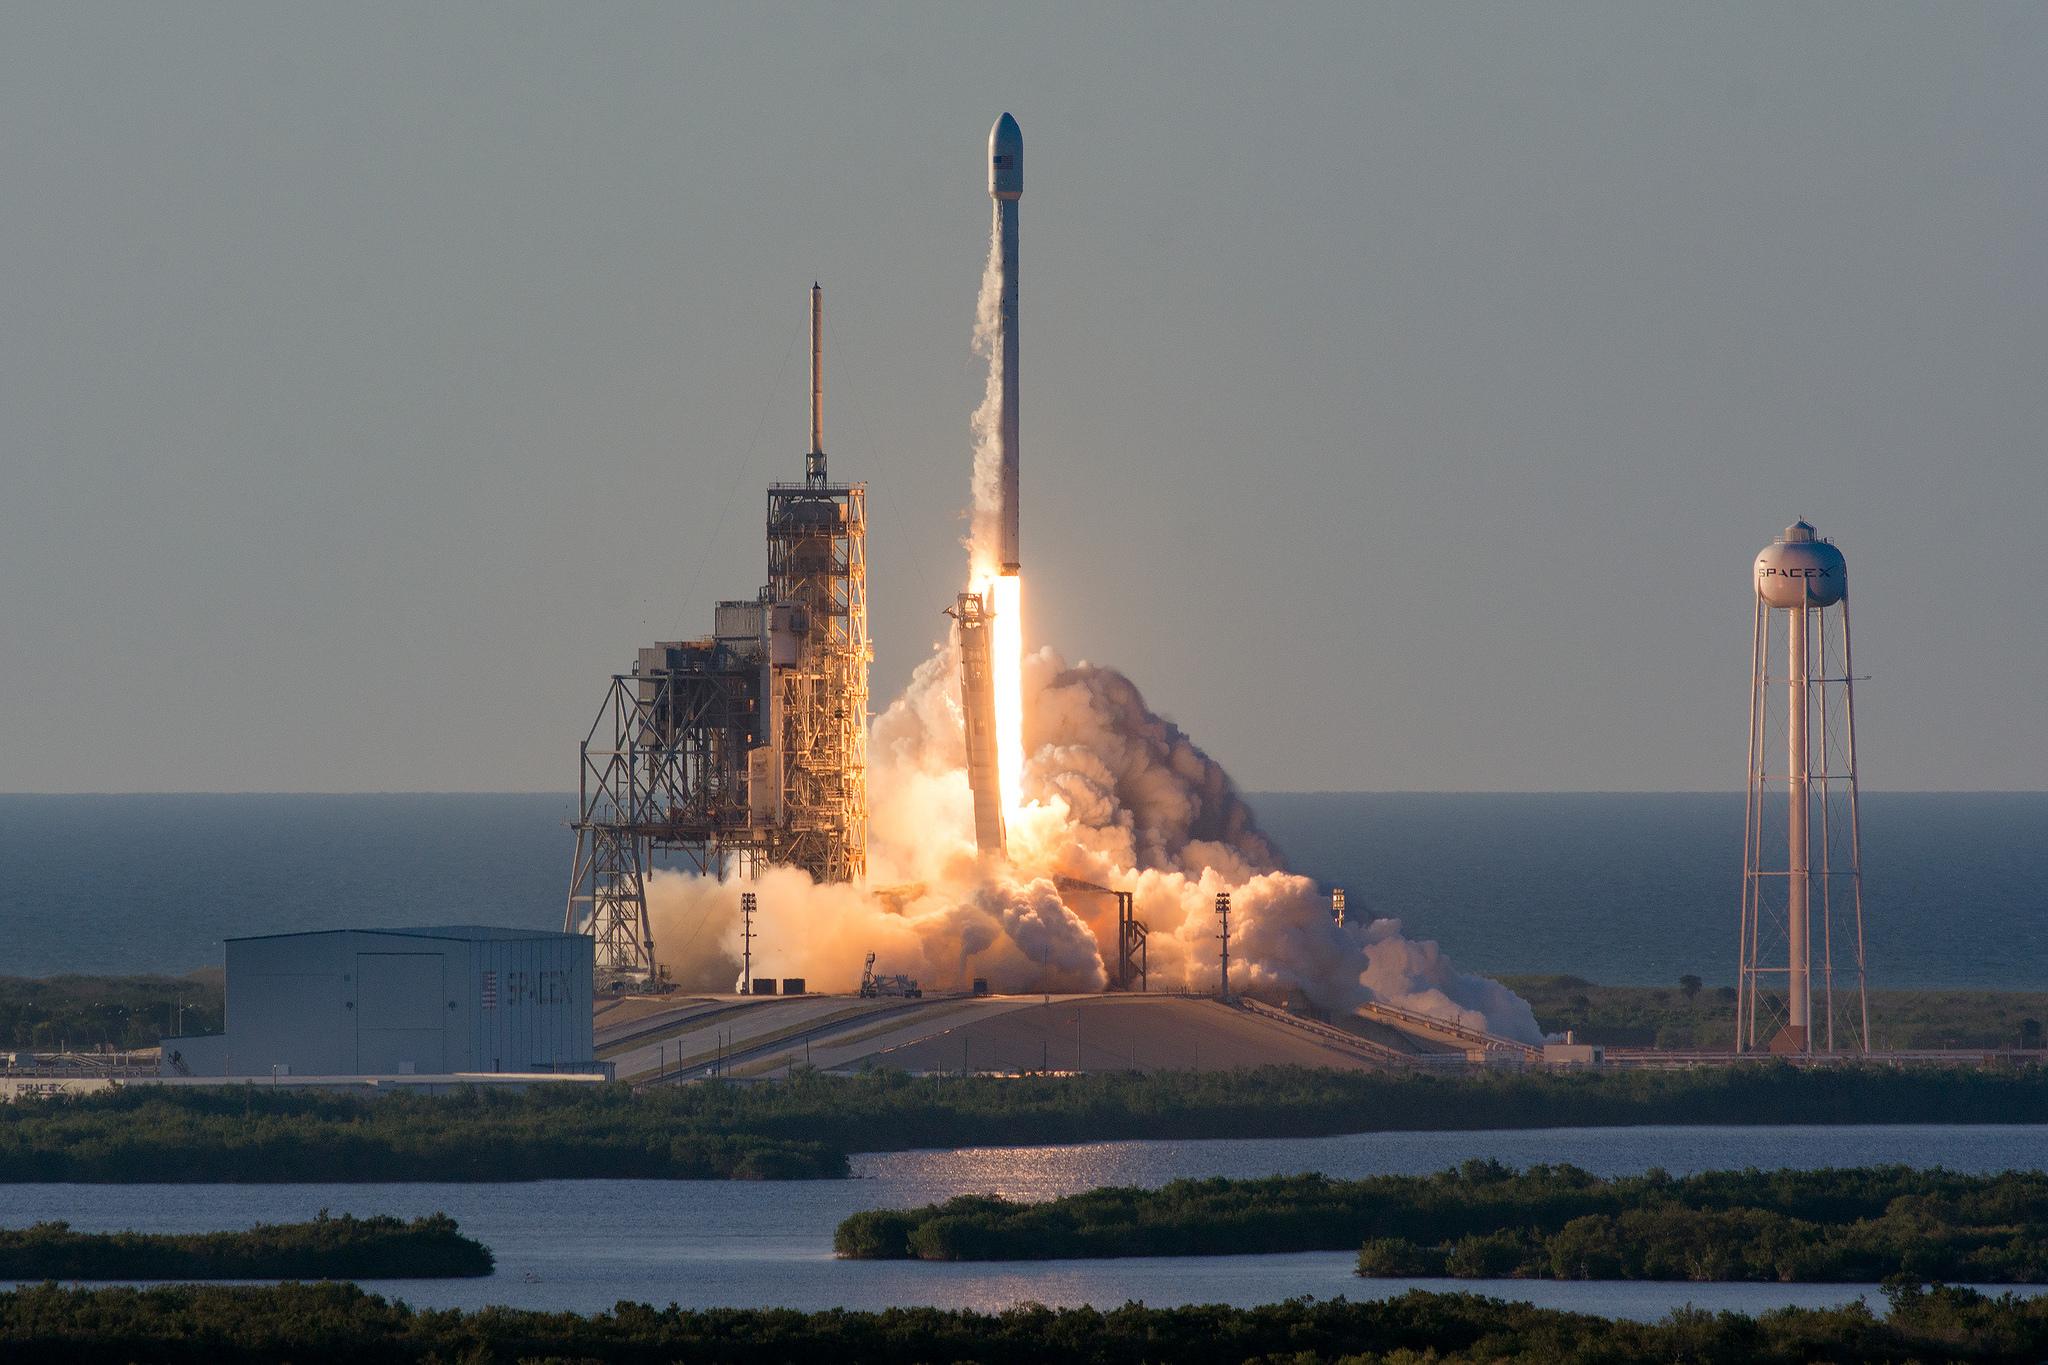 SpaceX благополучно запустила ракету Falcon 9 соспутником связи